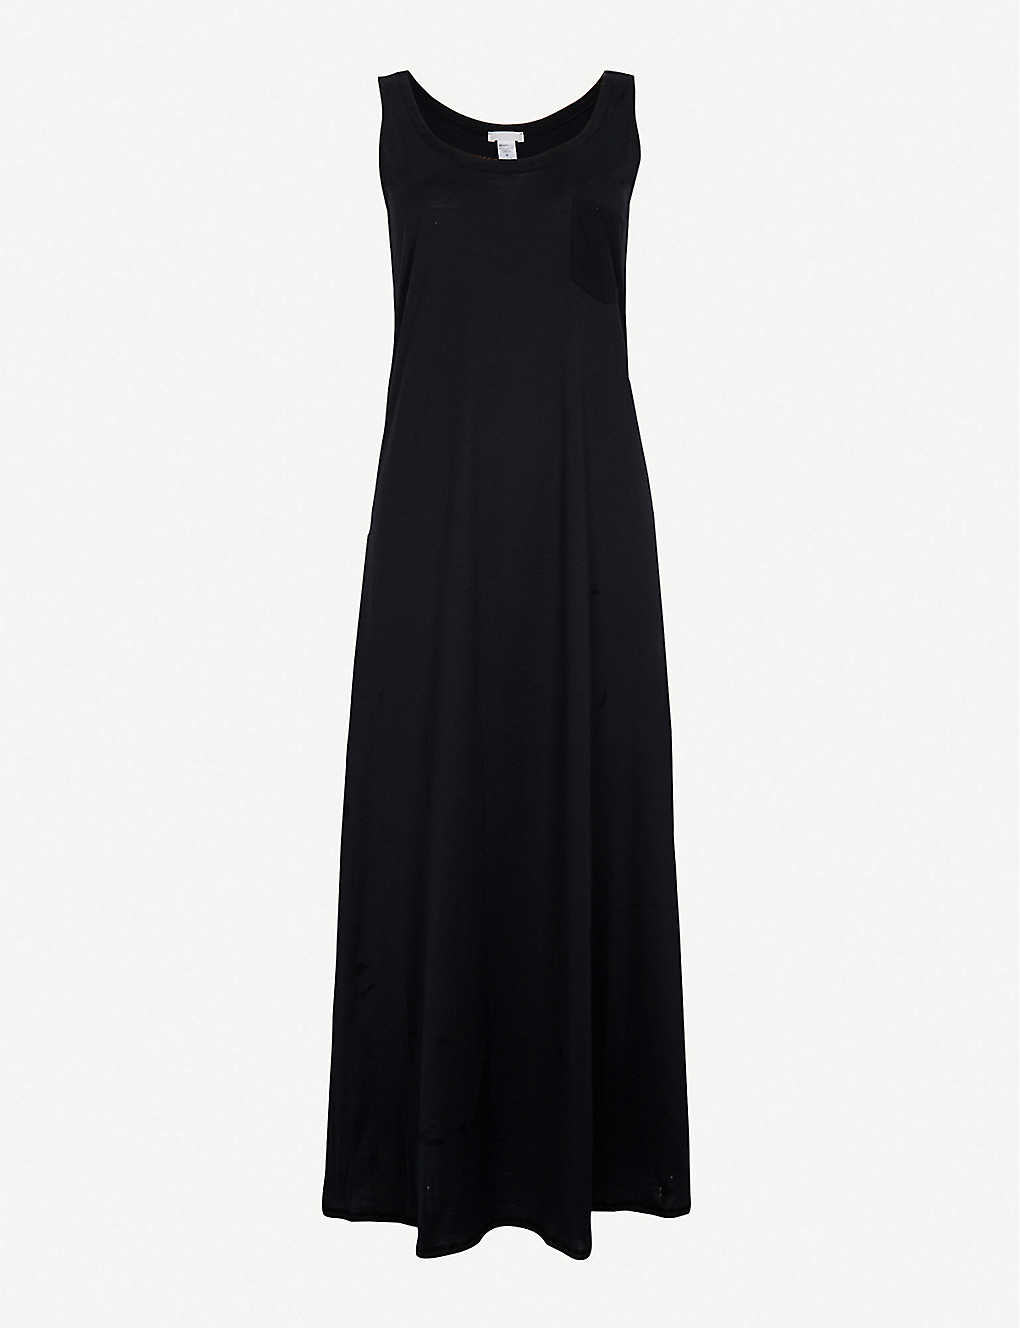 09b5a2db17 HANRO - Deluxe cotton-jersey night dress